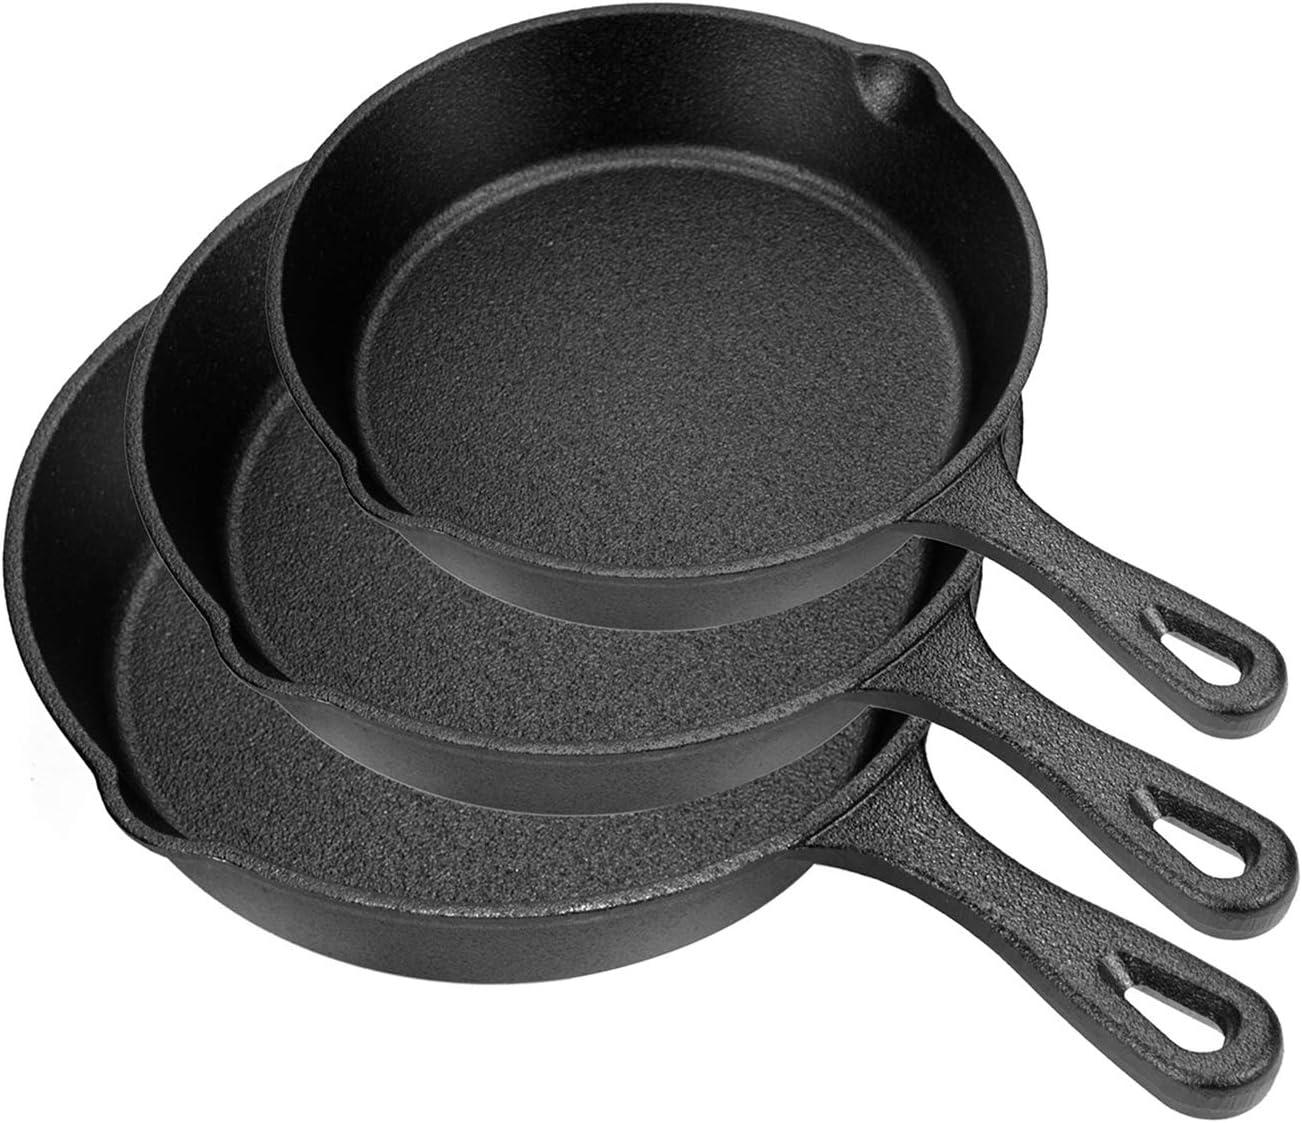 Lawei Set of 3 Cast Iron Skillets - 10